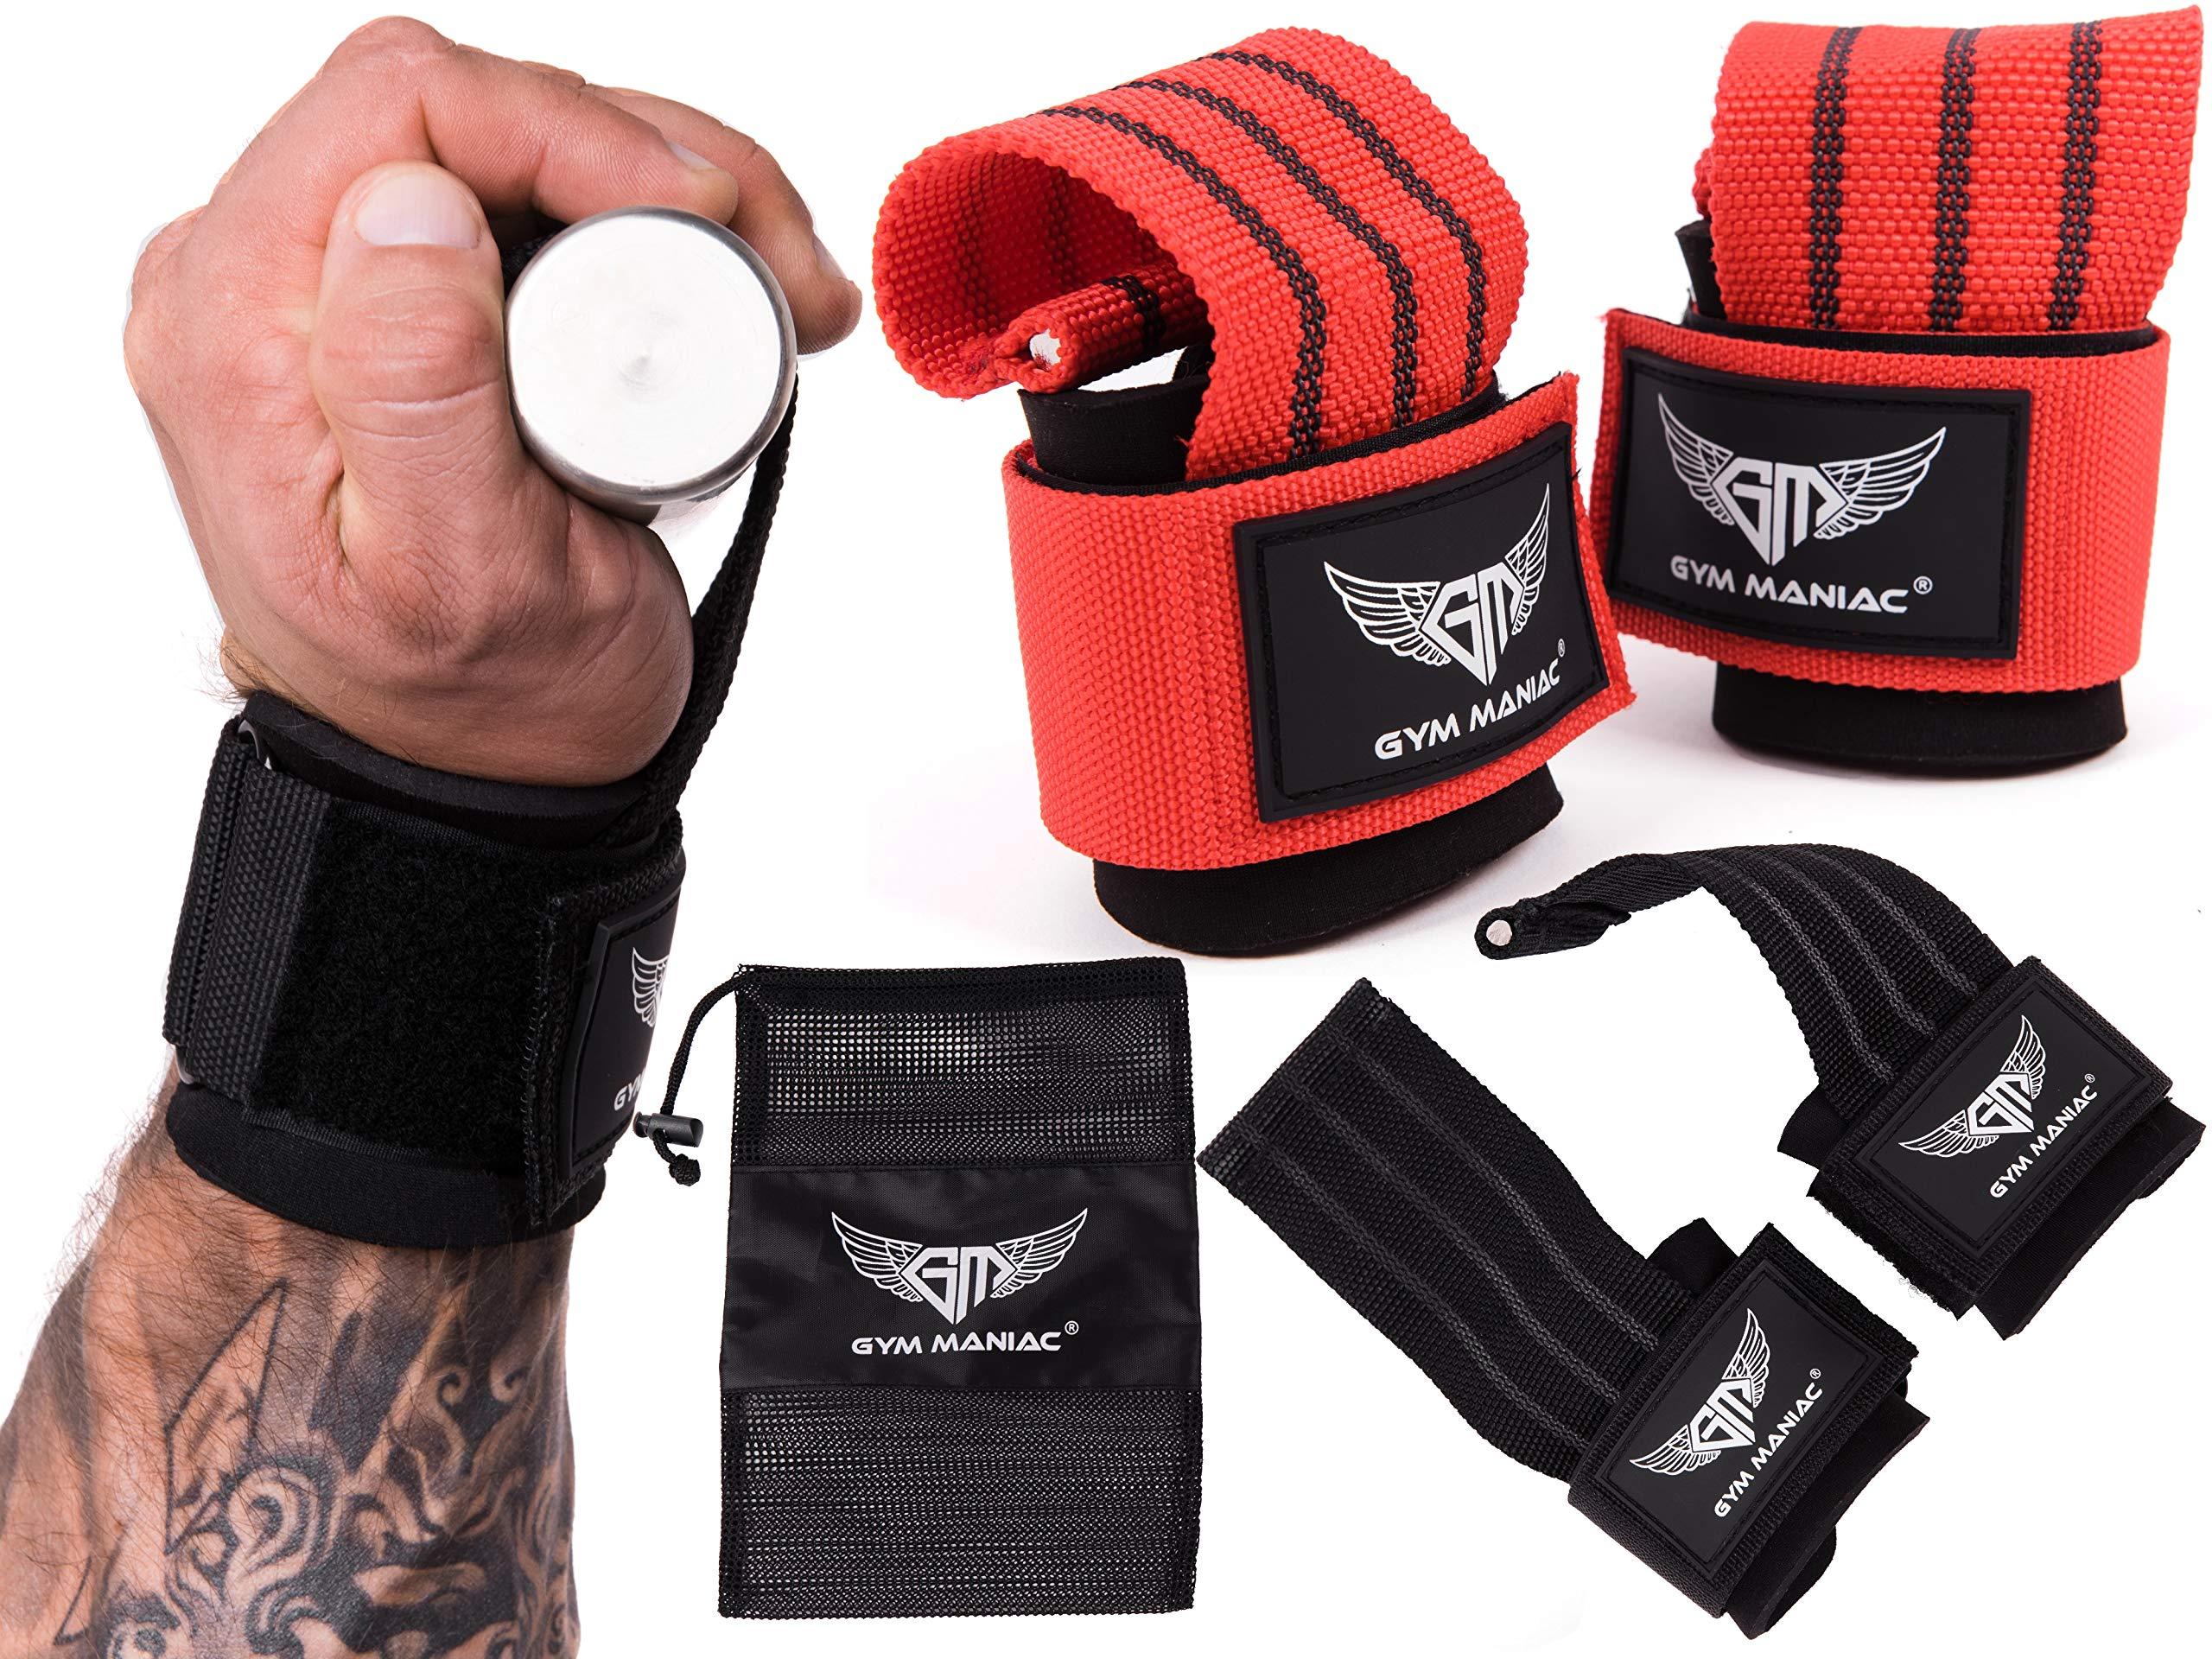 Gym Maniac GM Lifting Straps Wrist Protector for Weightlifting Bodybuilding Powerlifting Strength Training Men & Women (Black)